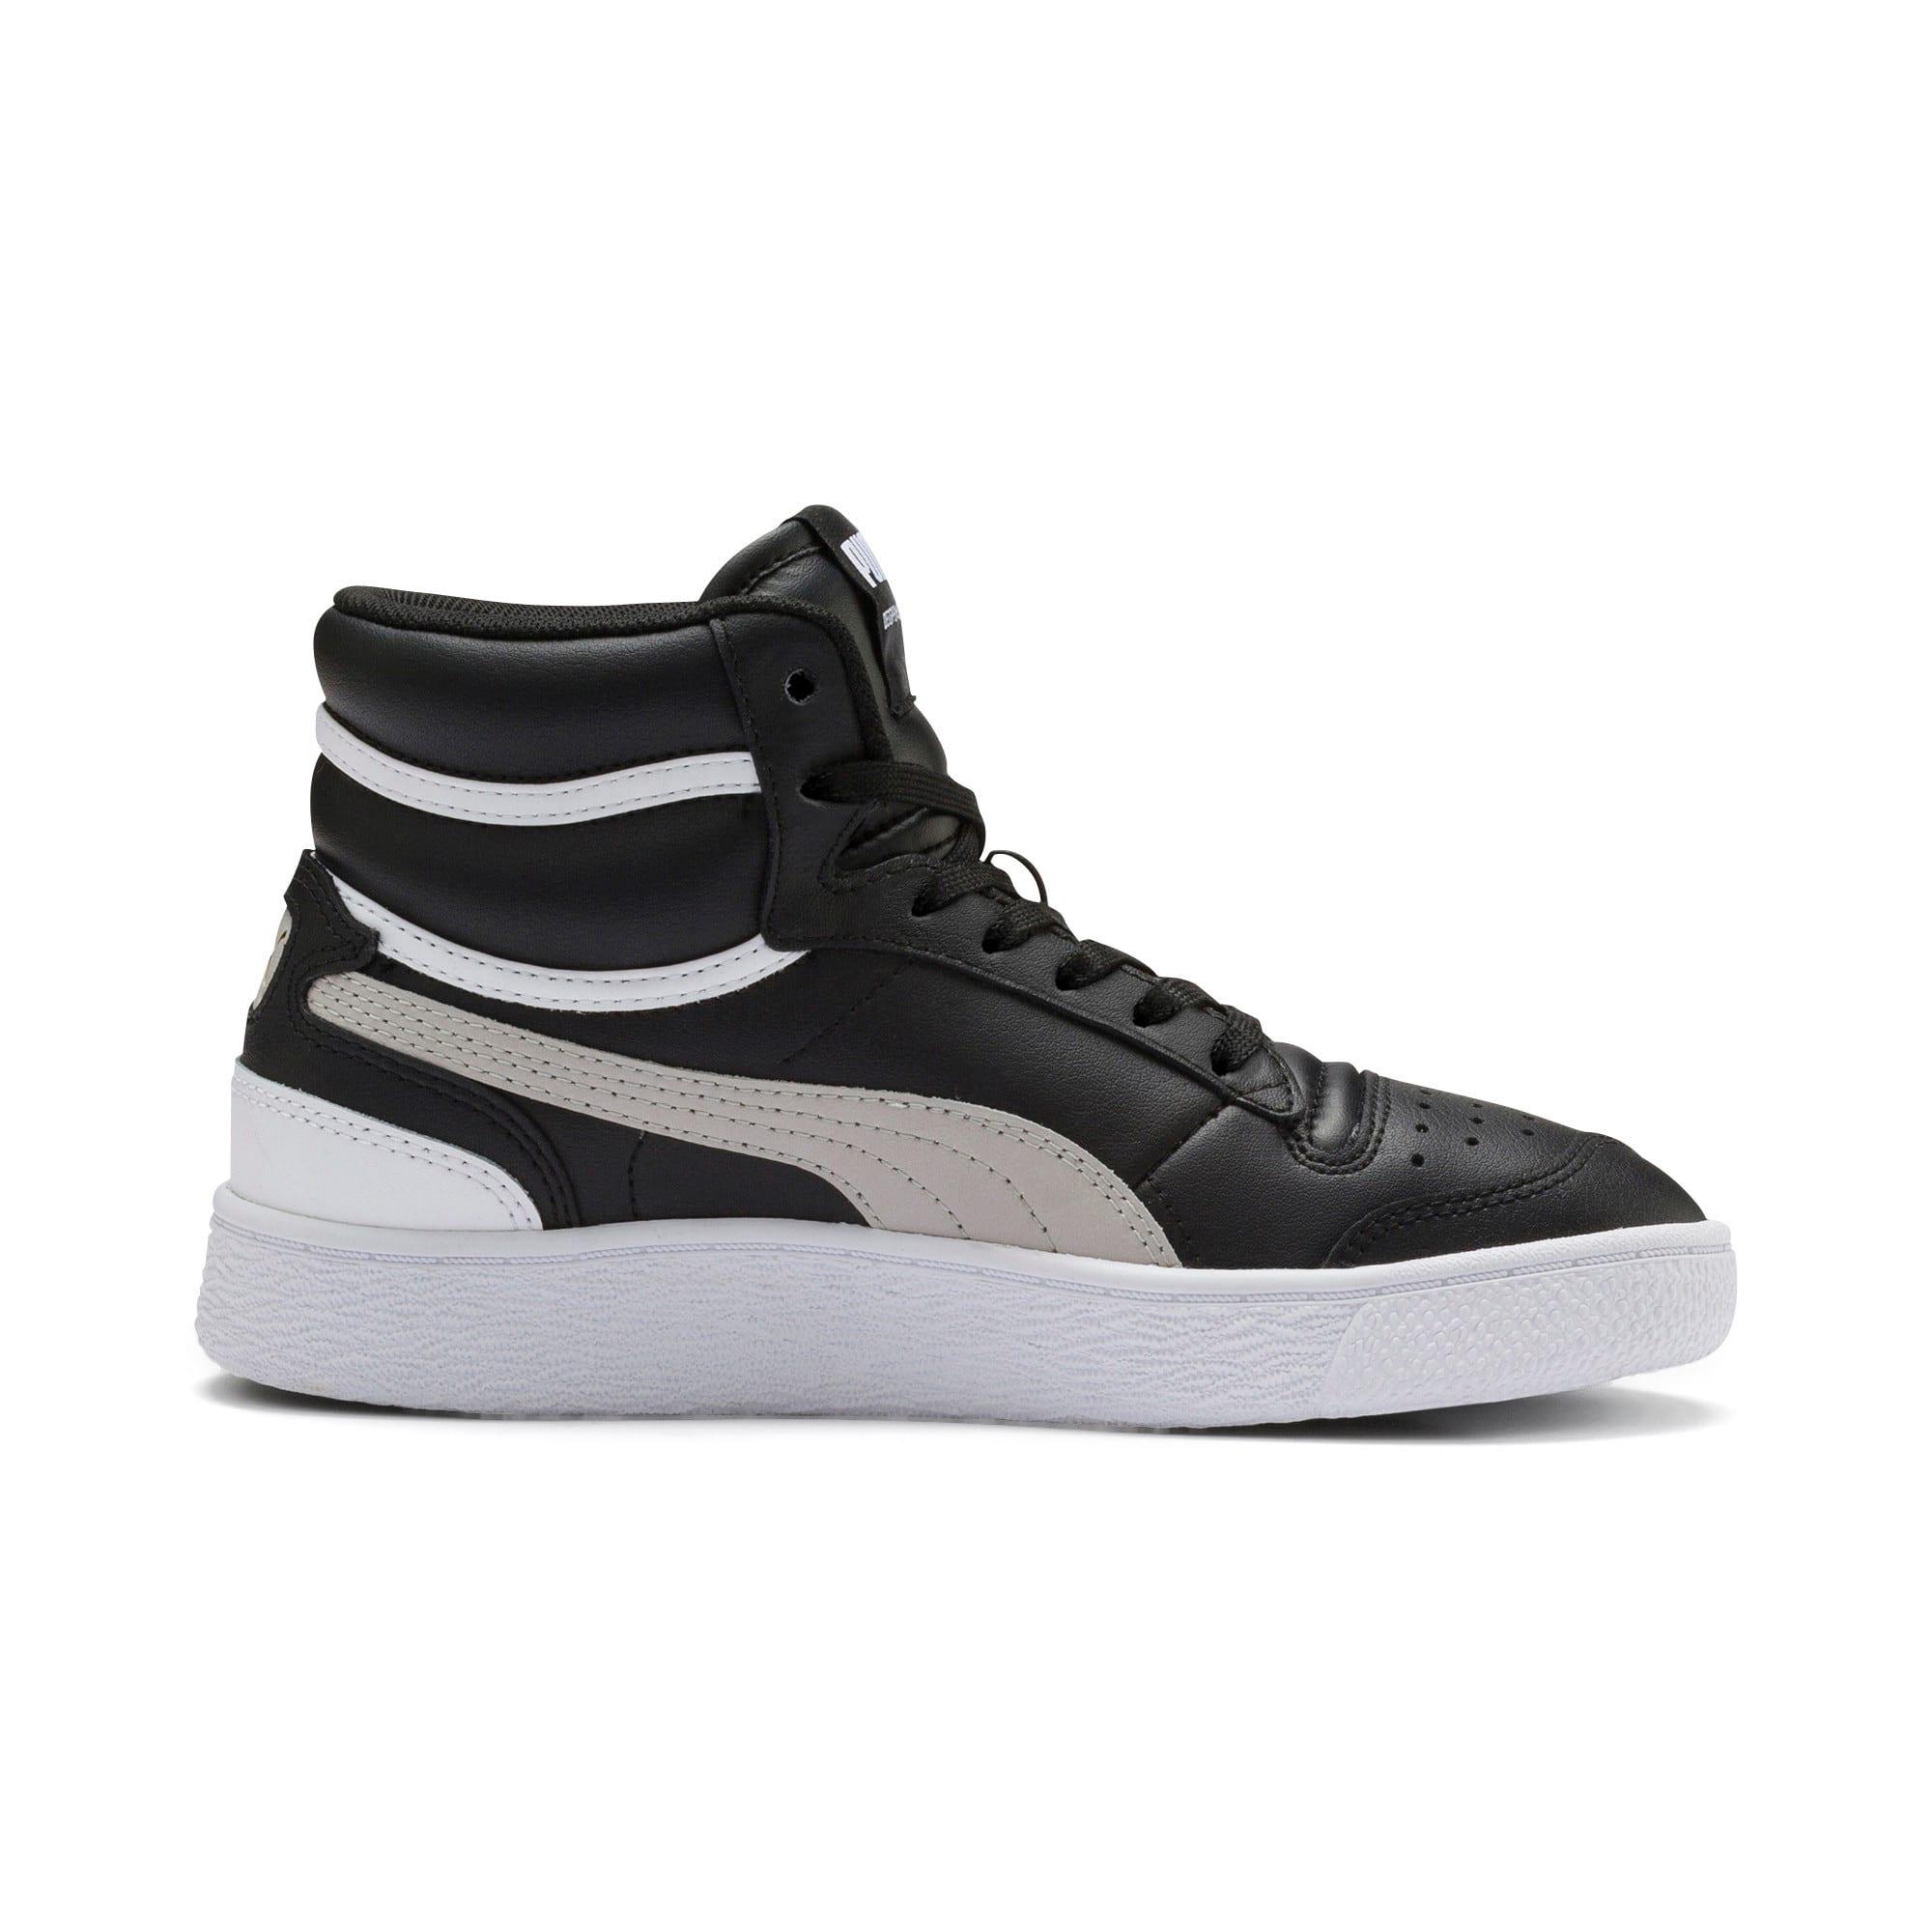 Thumbnail 5 of Ralph Sampson Mid Sneakers JR, Black-Gray Violet-White, medium